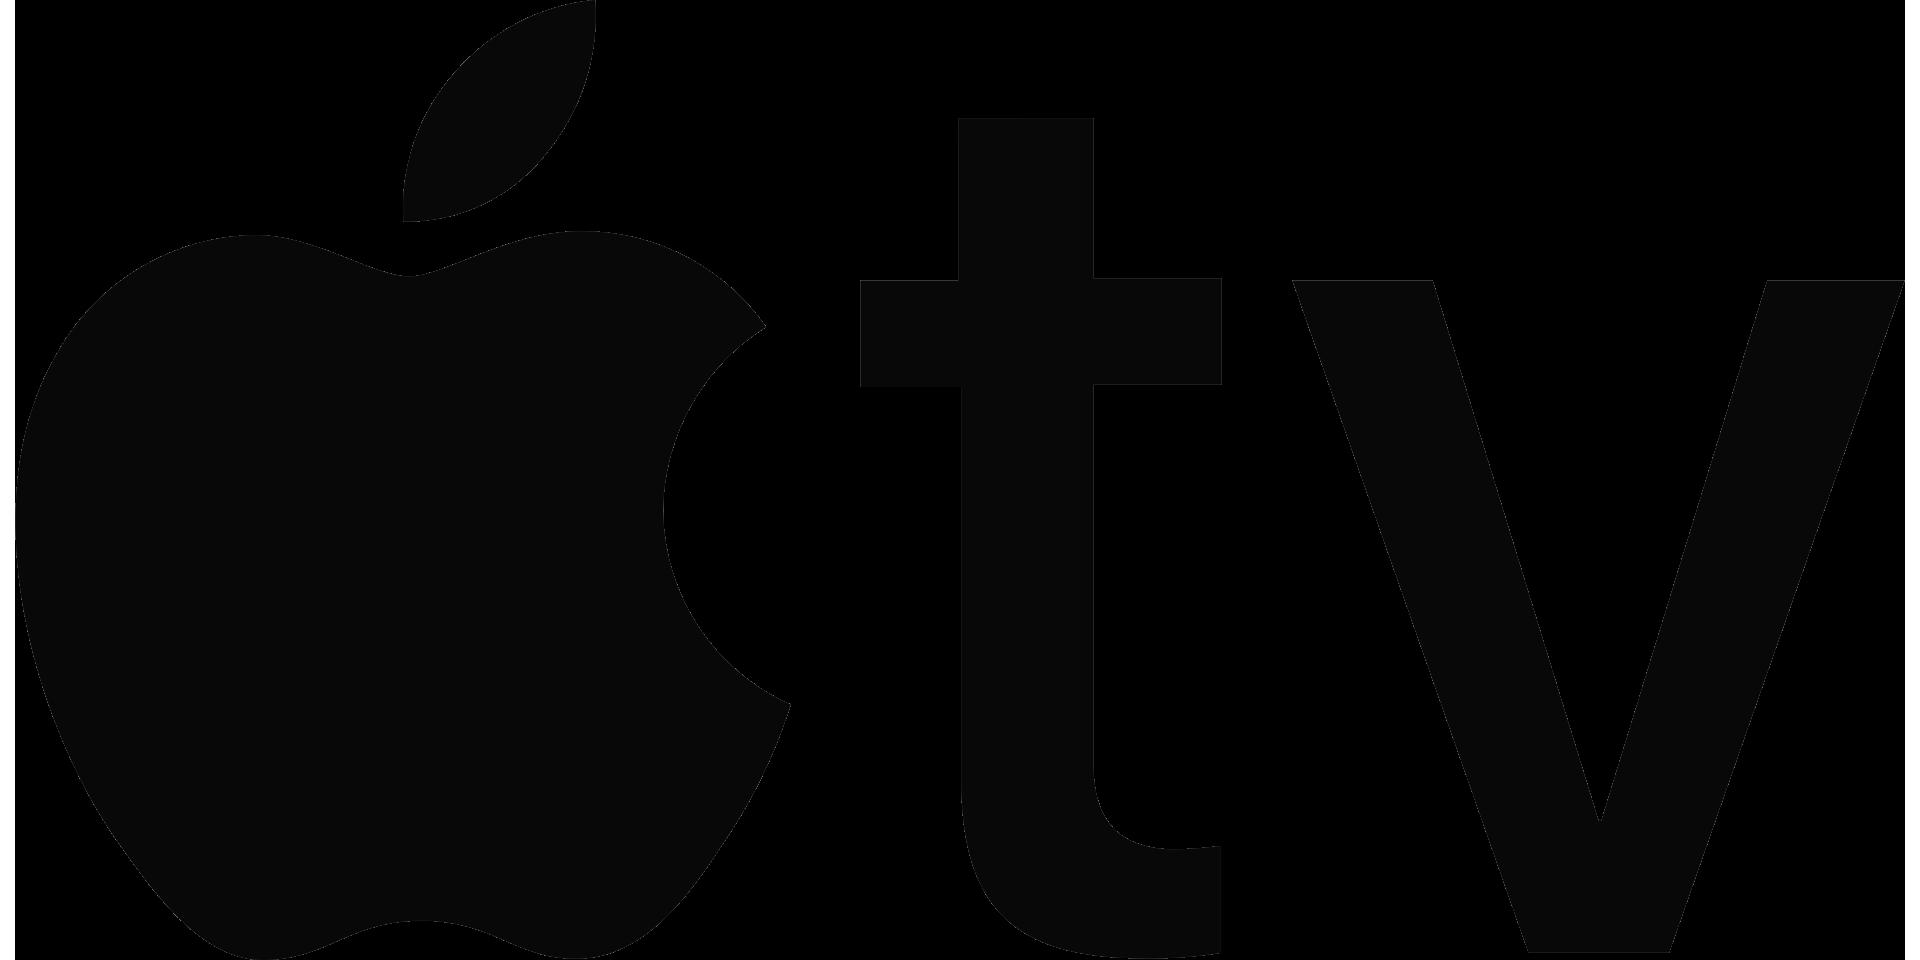 Apple_TV logo black